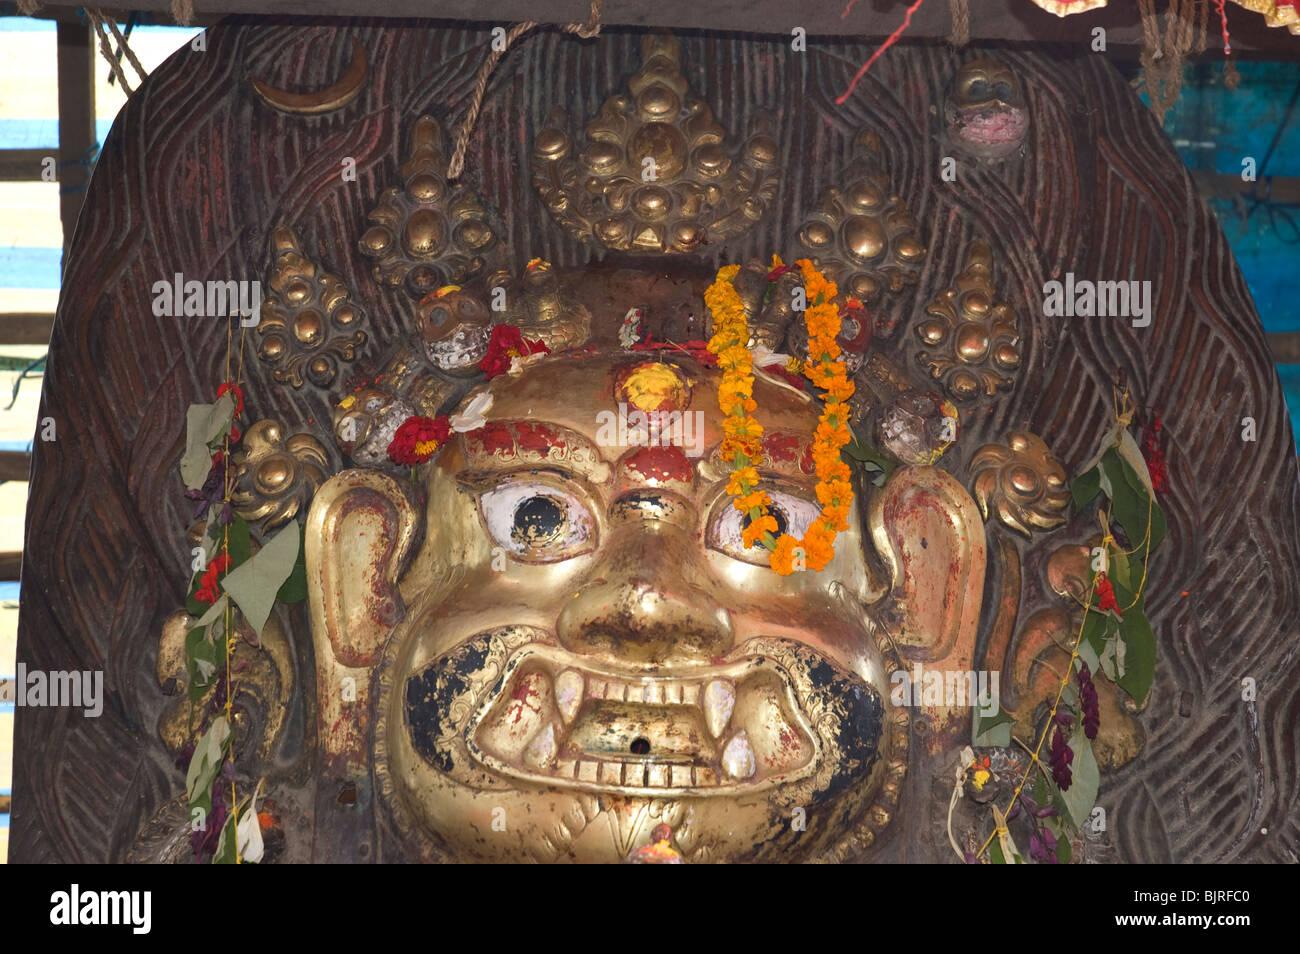 Fierce temple God, Seto ( white ) Bhairab, on view during Indra Jatra, in Durbar Square, Kathmandu, Nepal. - Stock Image